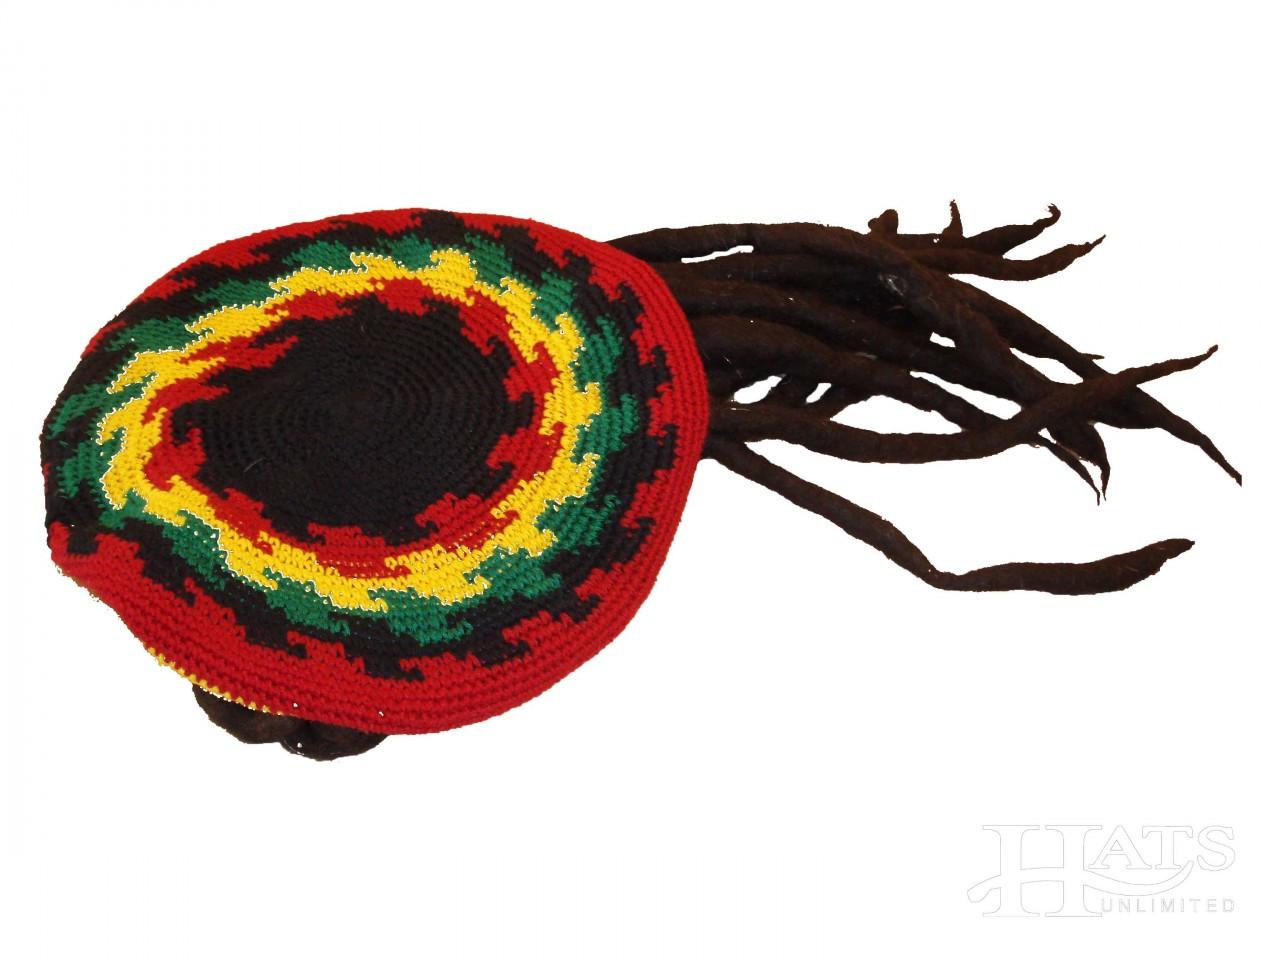 c4eea7e92 Adventure Trading - Rasta Tam Hat With Dreads